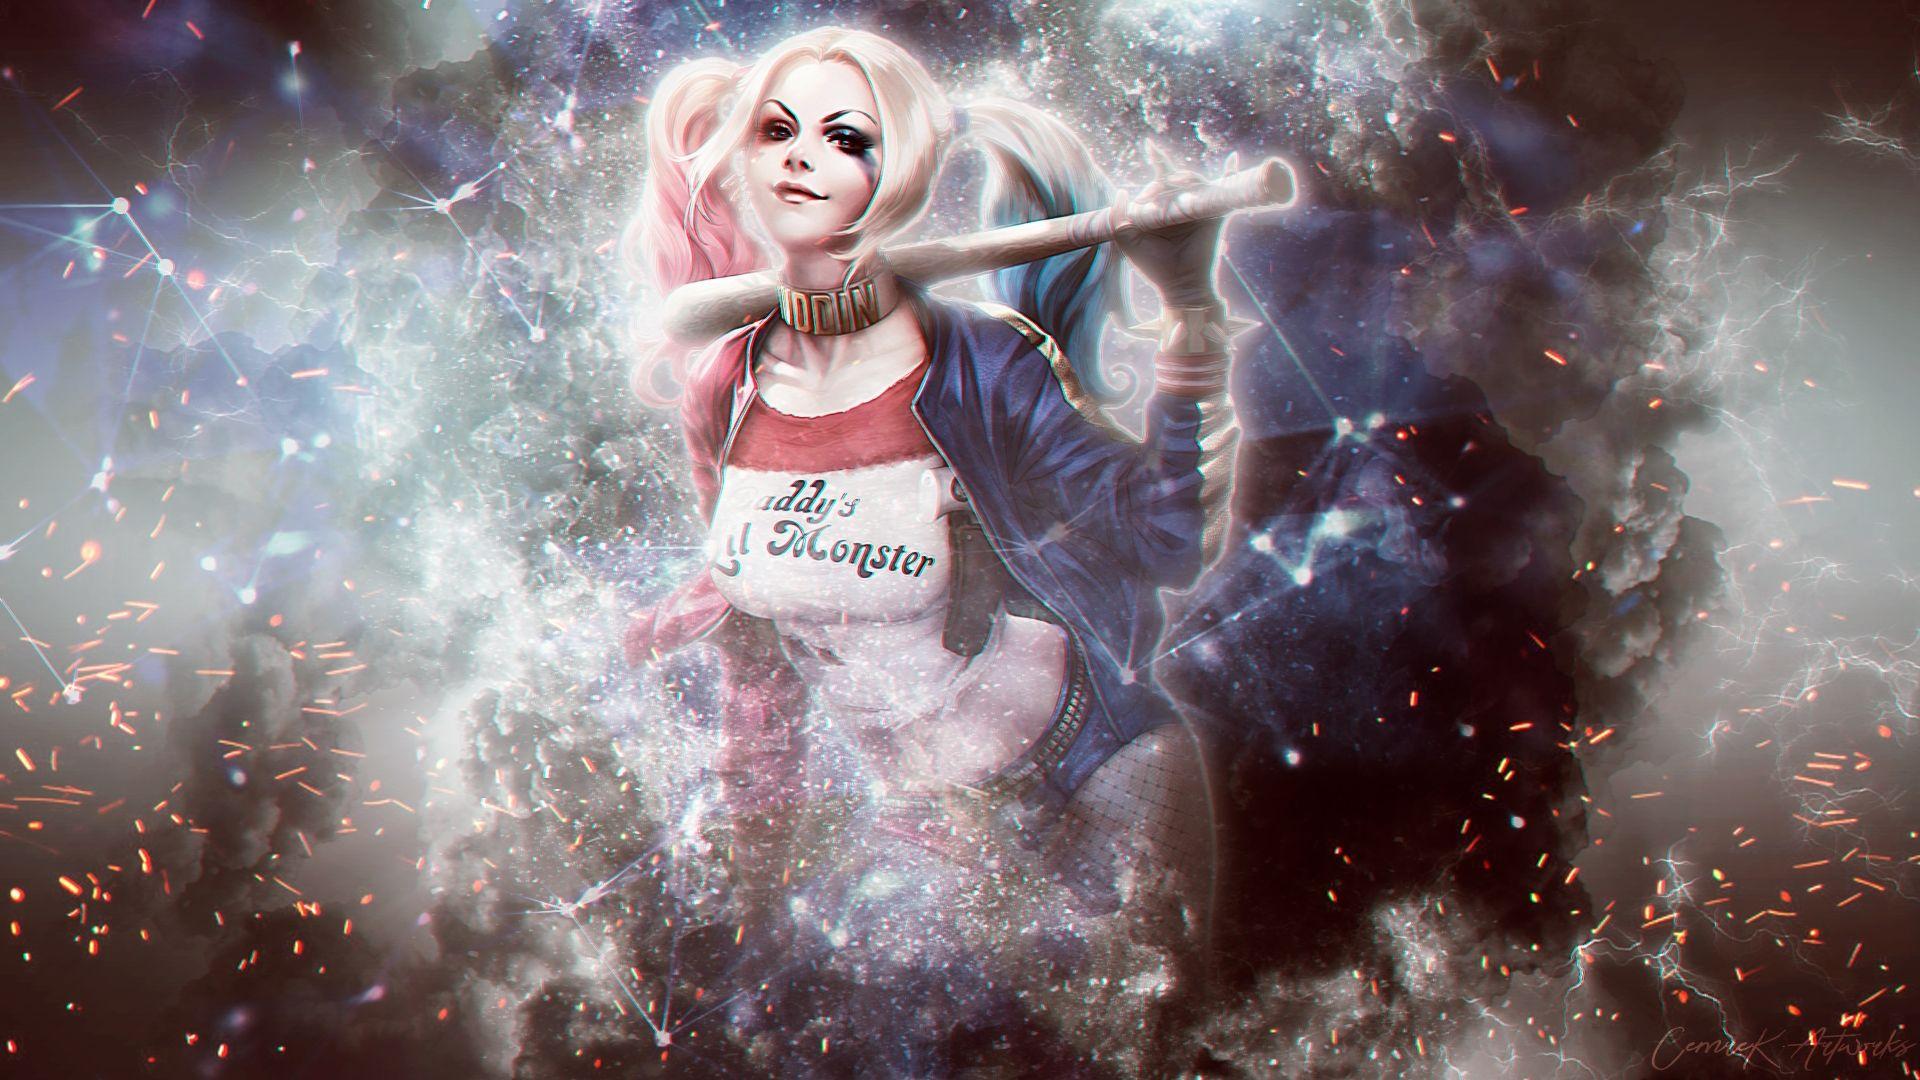 Suicide Squad Harley Quinn art, Computer Wallpaper